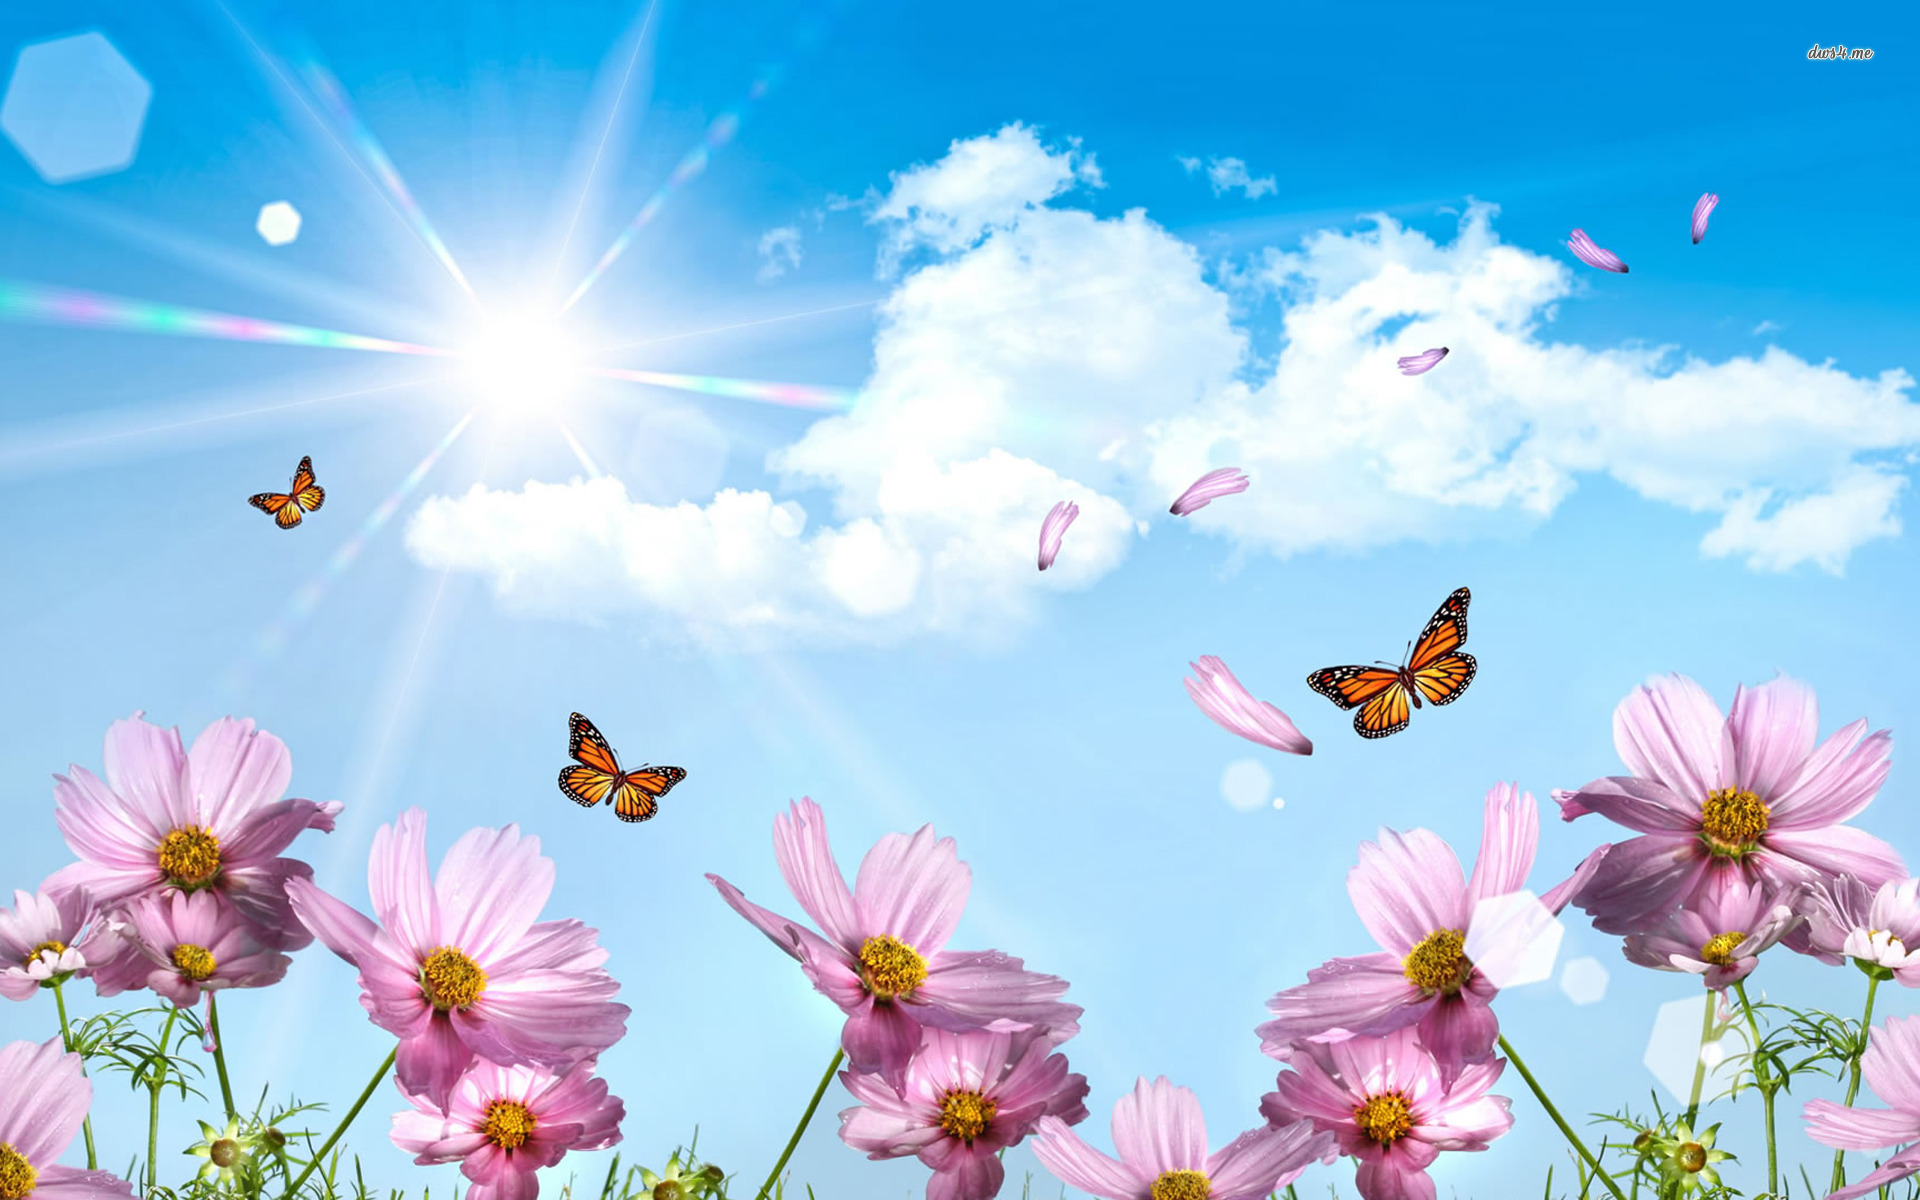 Spring Wallpaper   Spring Hd 149850   HD Wallpaper Download 1920x1200